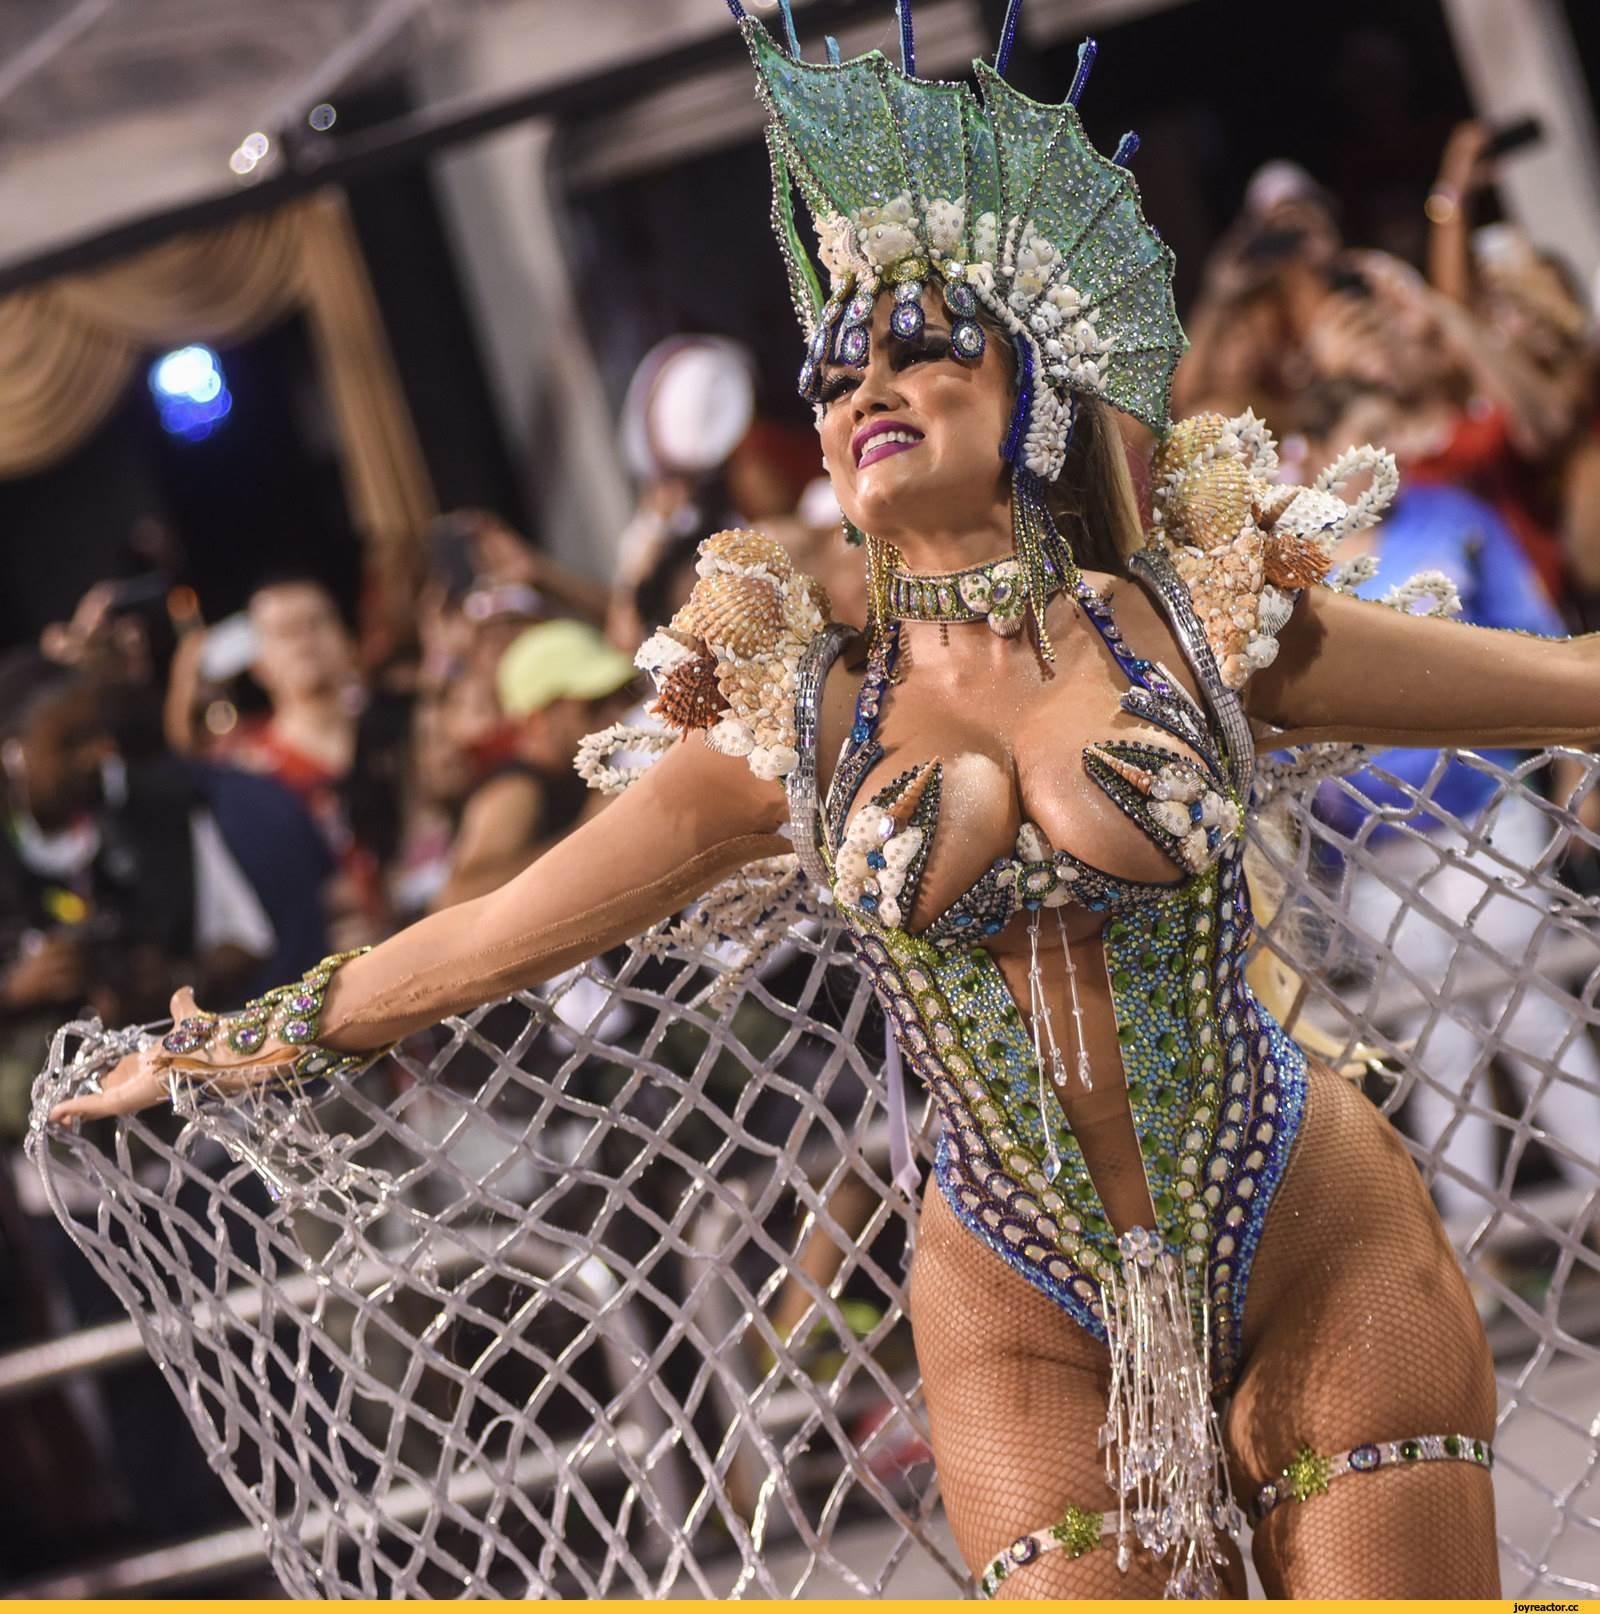 foto-karnaval-samie-seksualnie-devushki-porno-zrelih